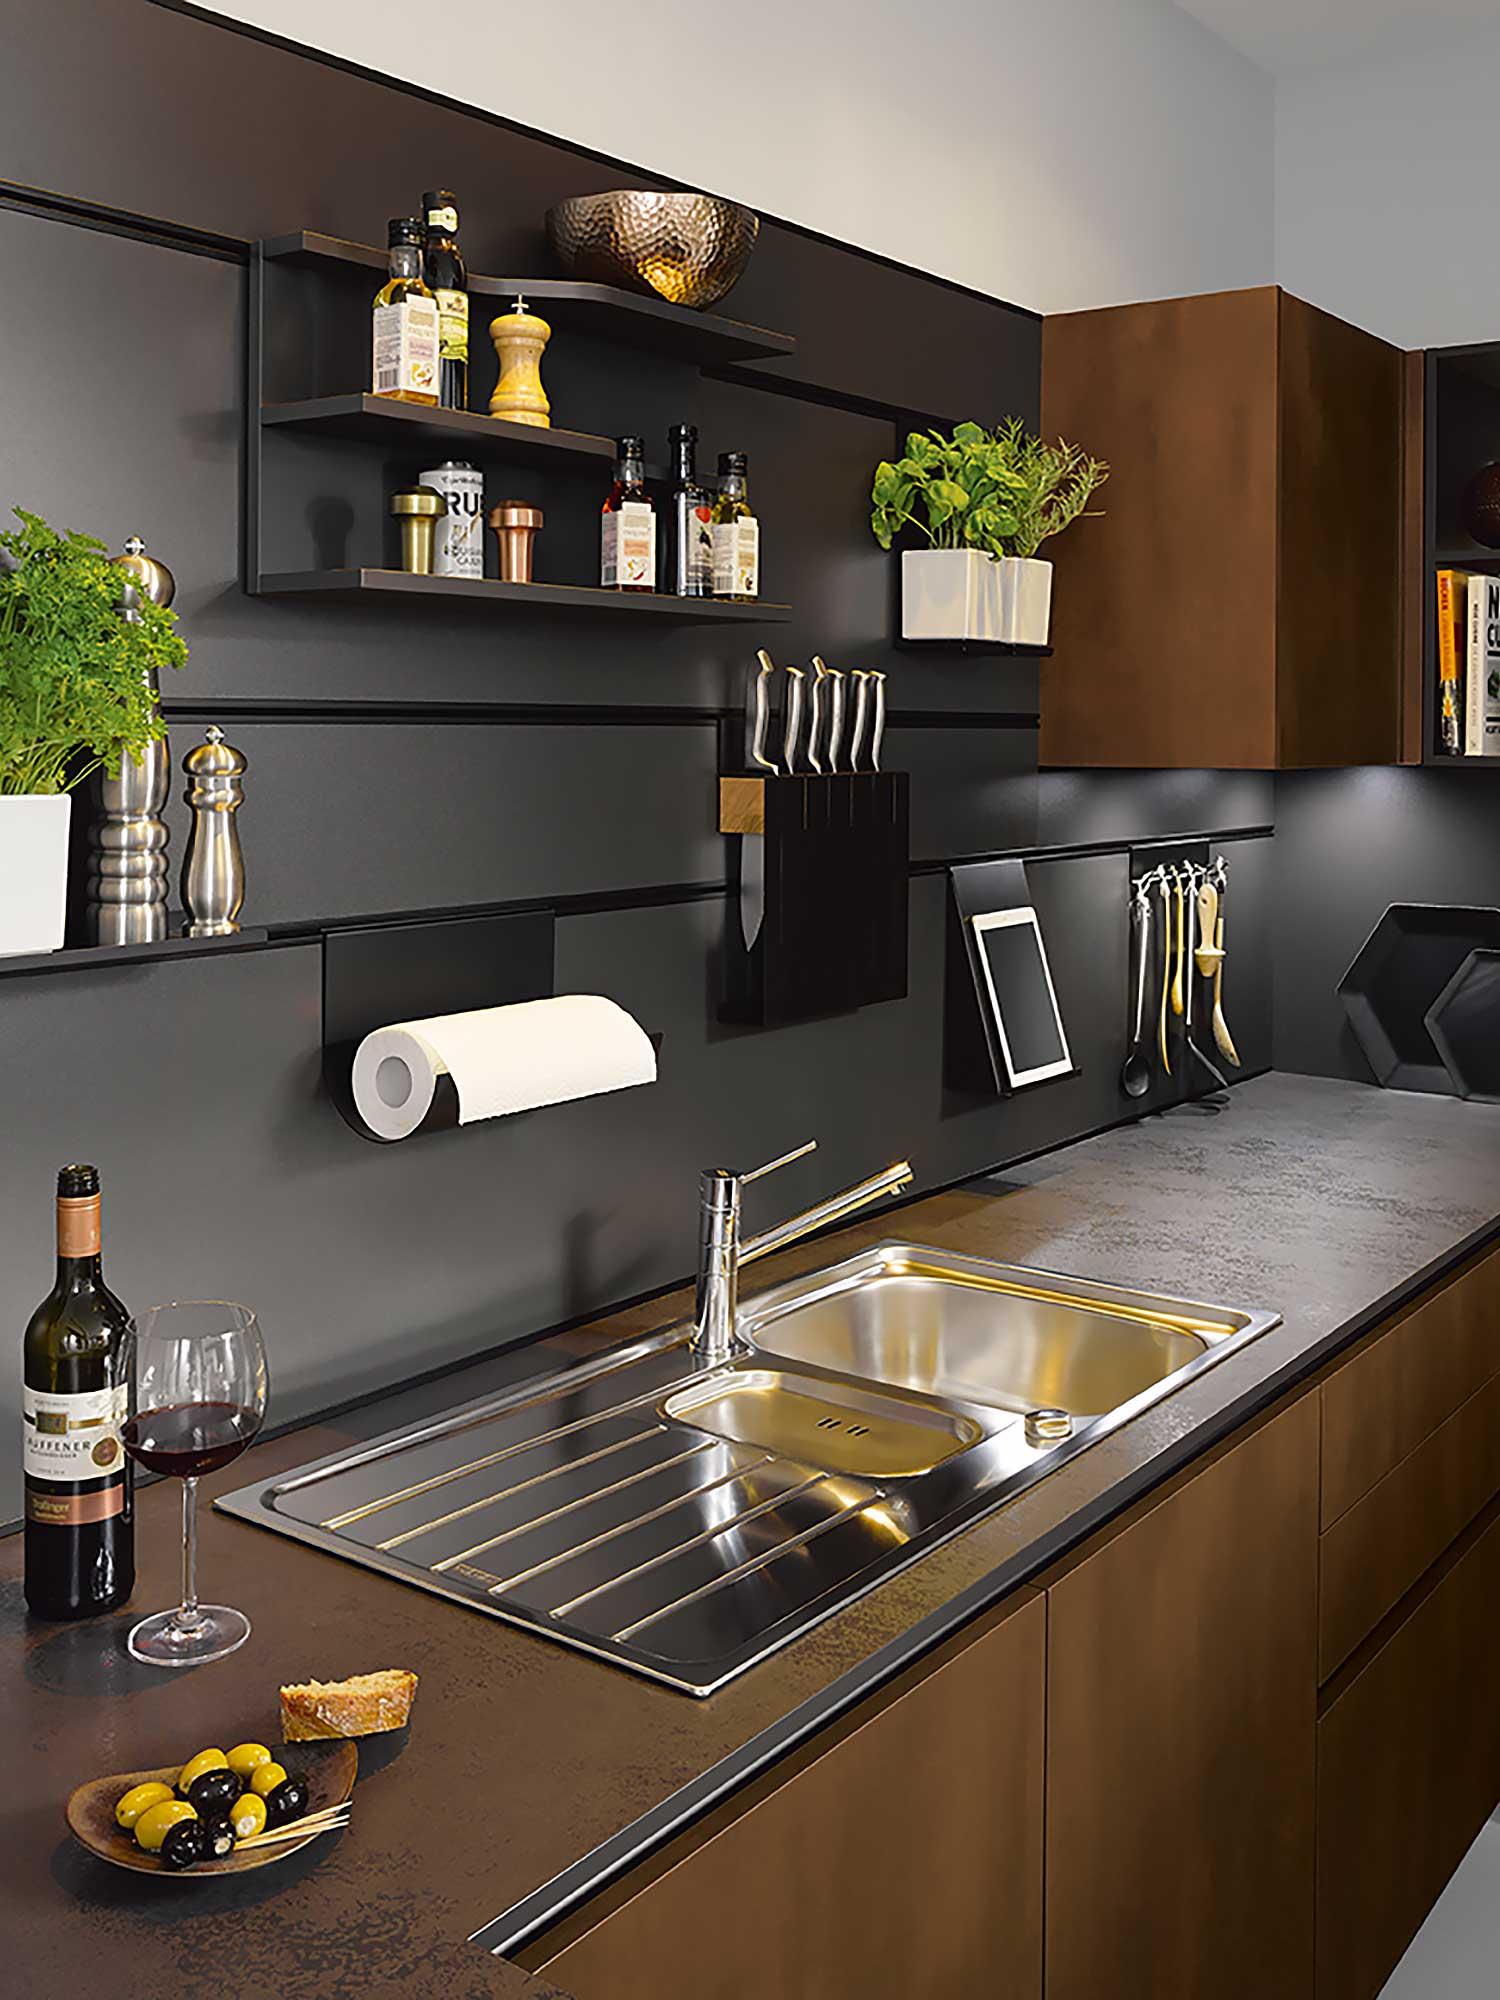 Schuller Panel System kitchen splashback